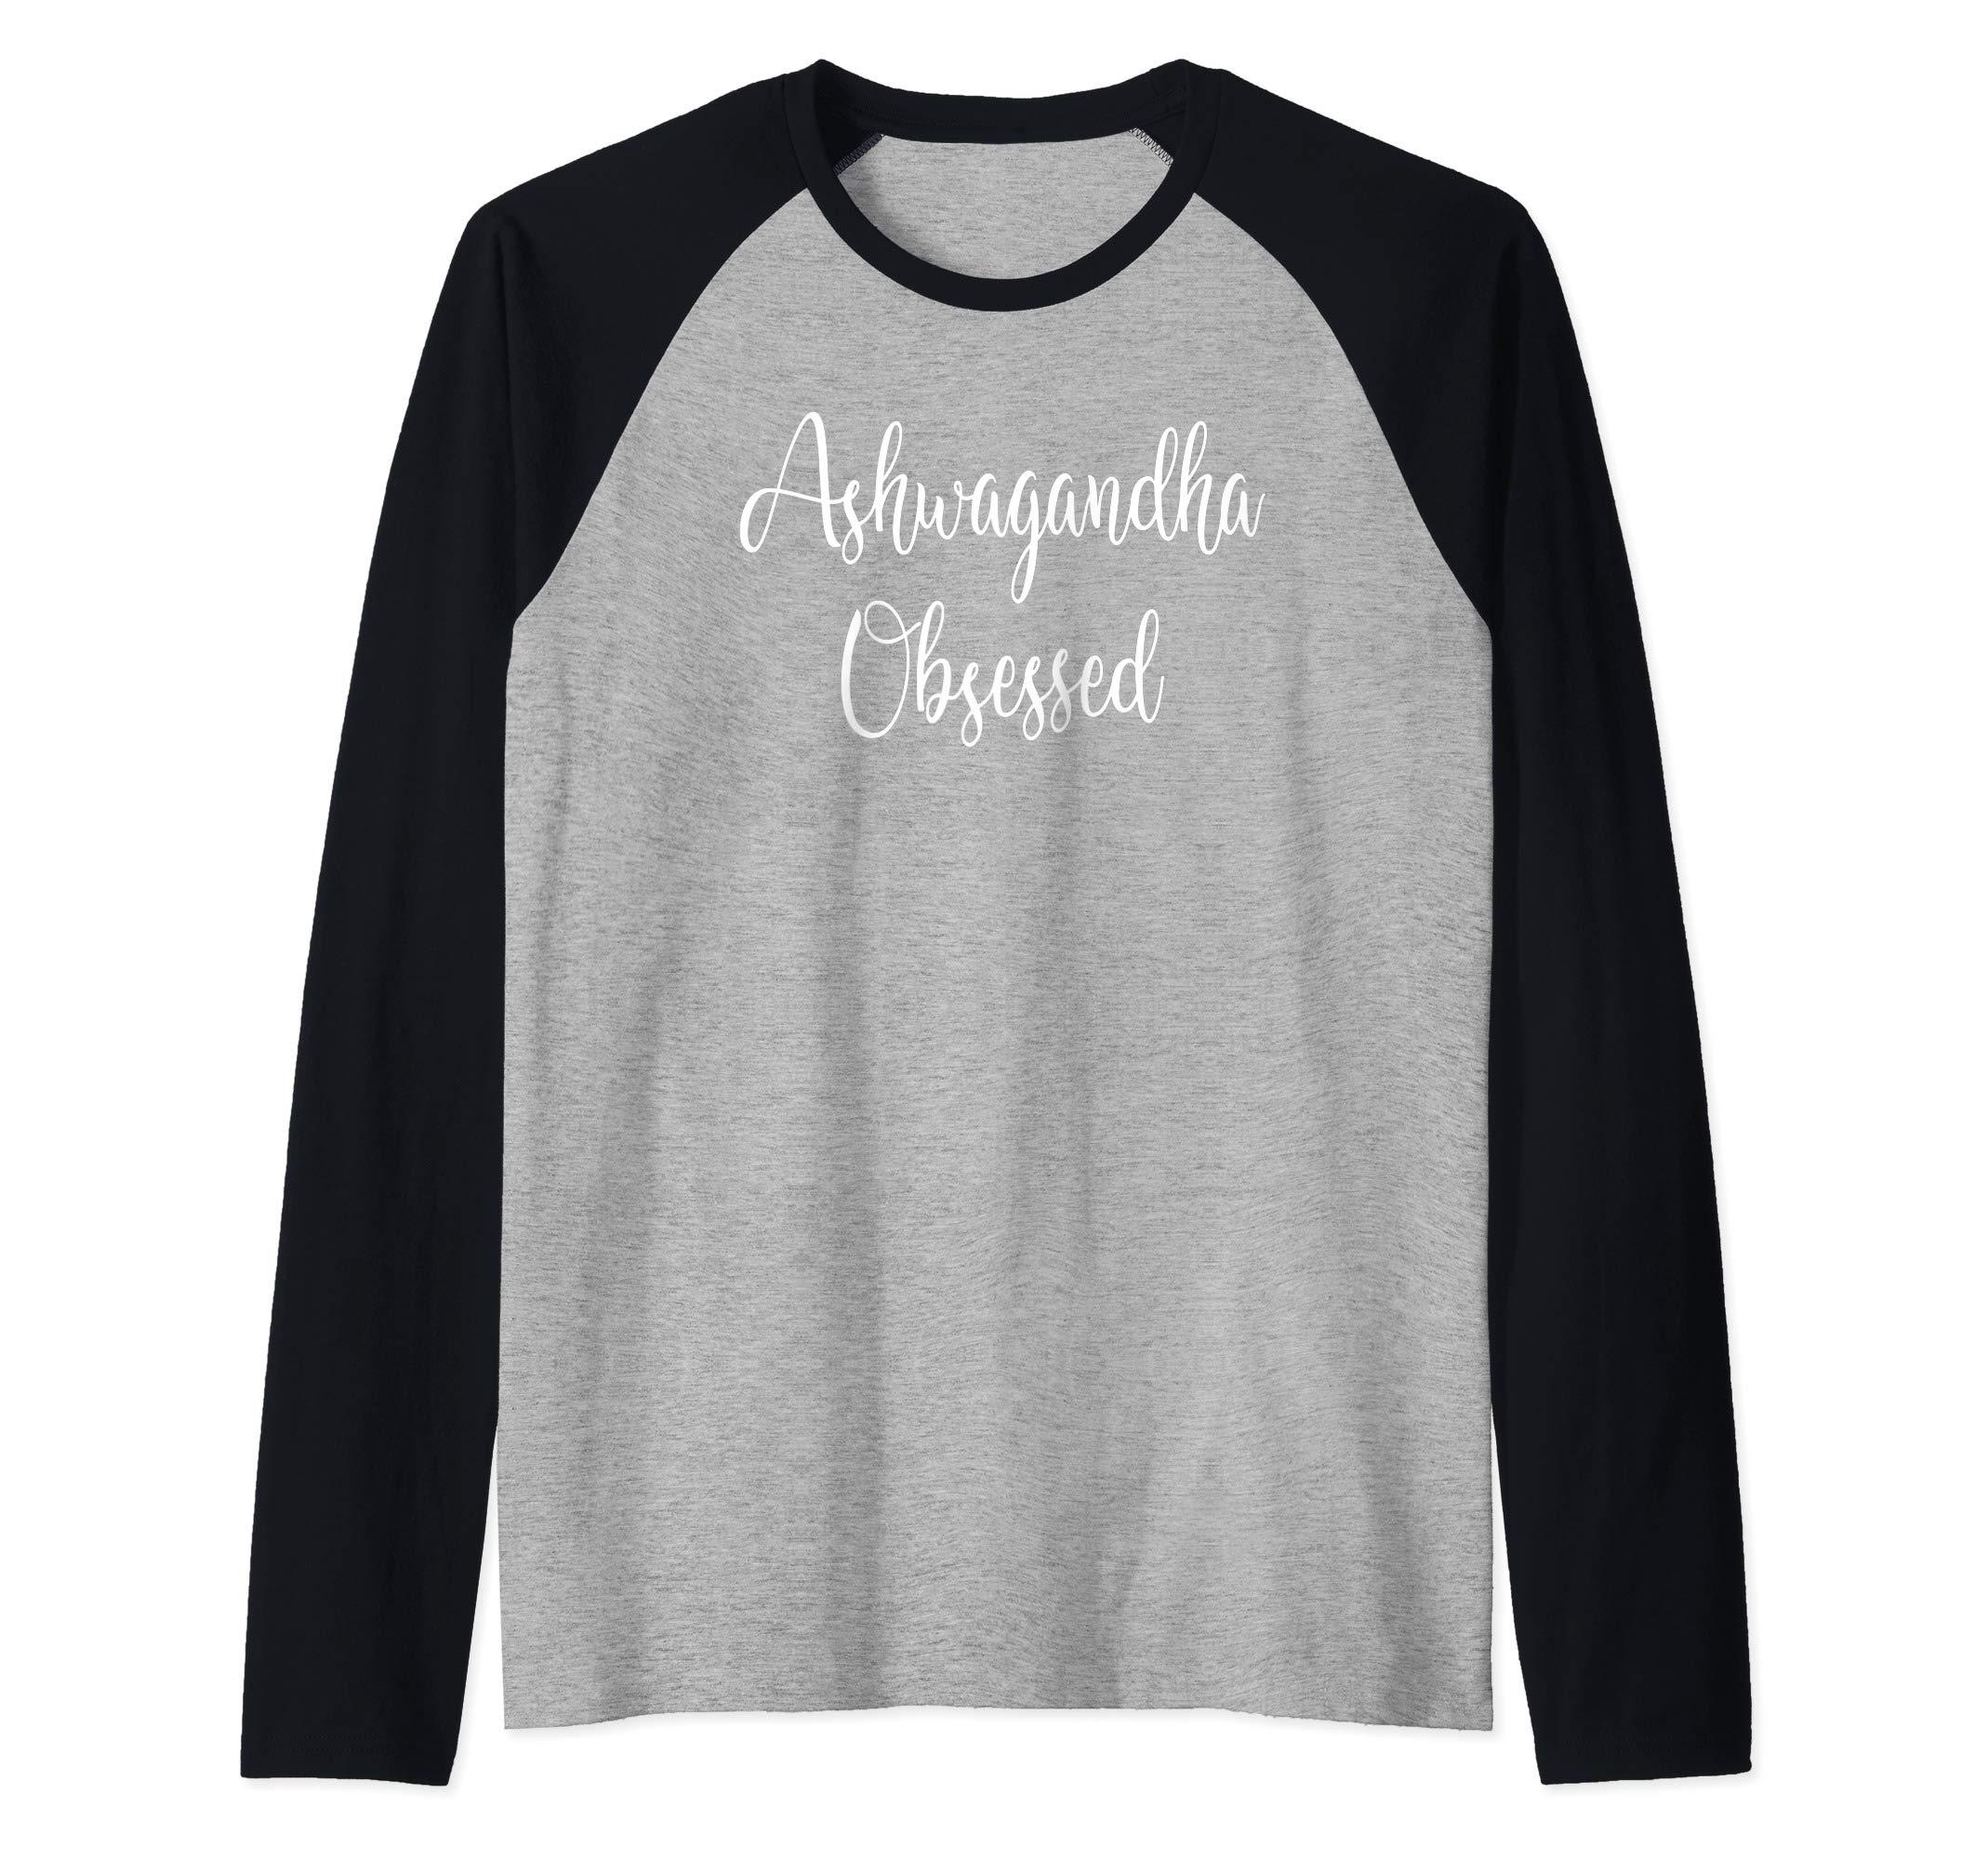 Ashwagandha Powder Tshirt | Health Supplements Tshirt Raglan Baseball Tee by Ashwagandha Powder Tshirts